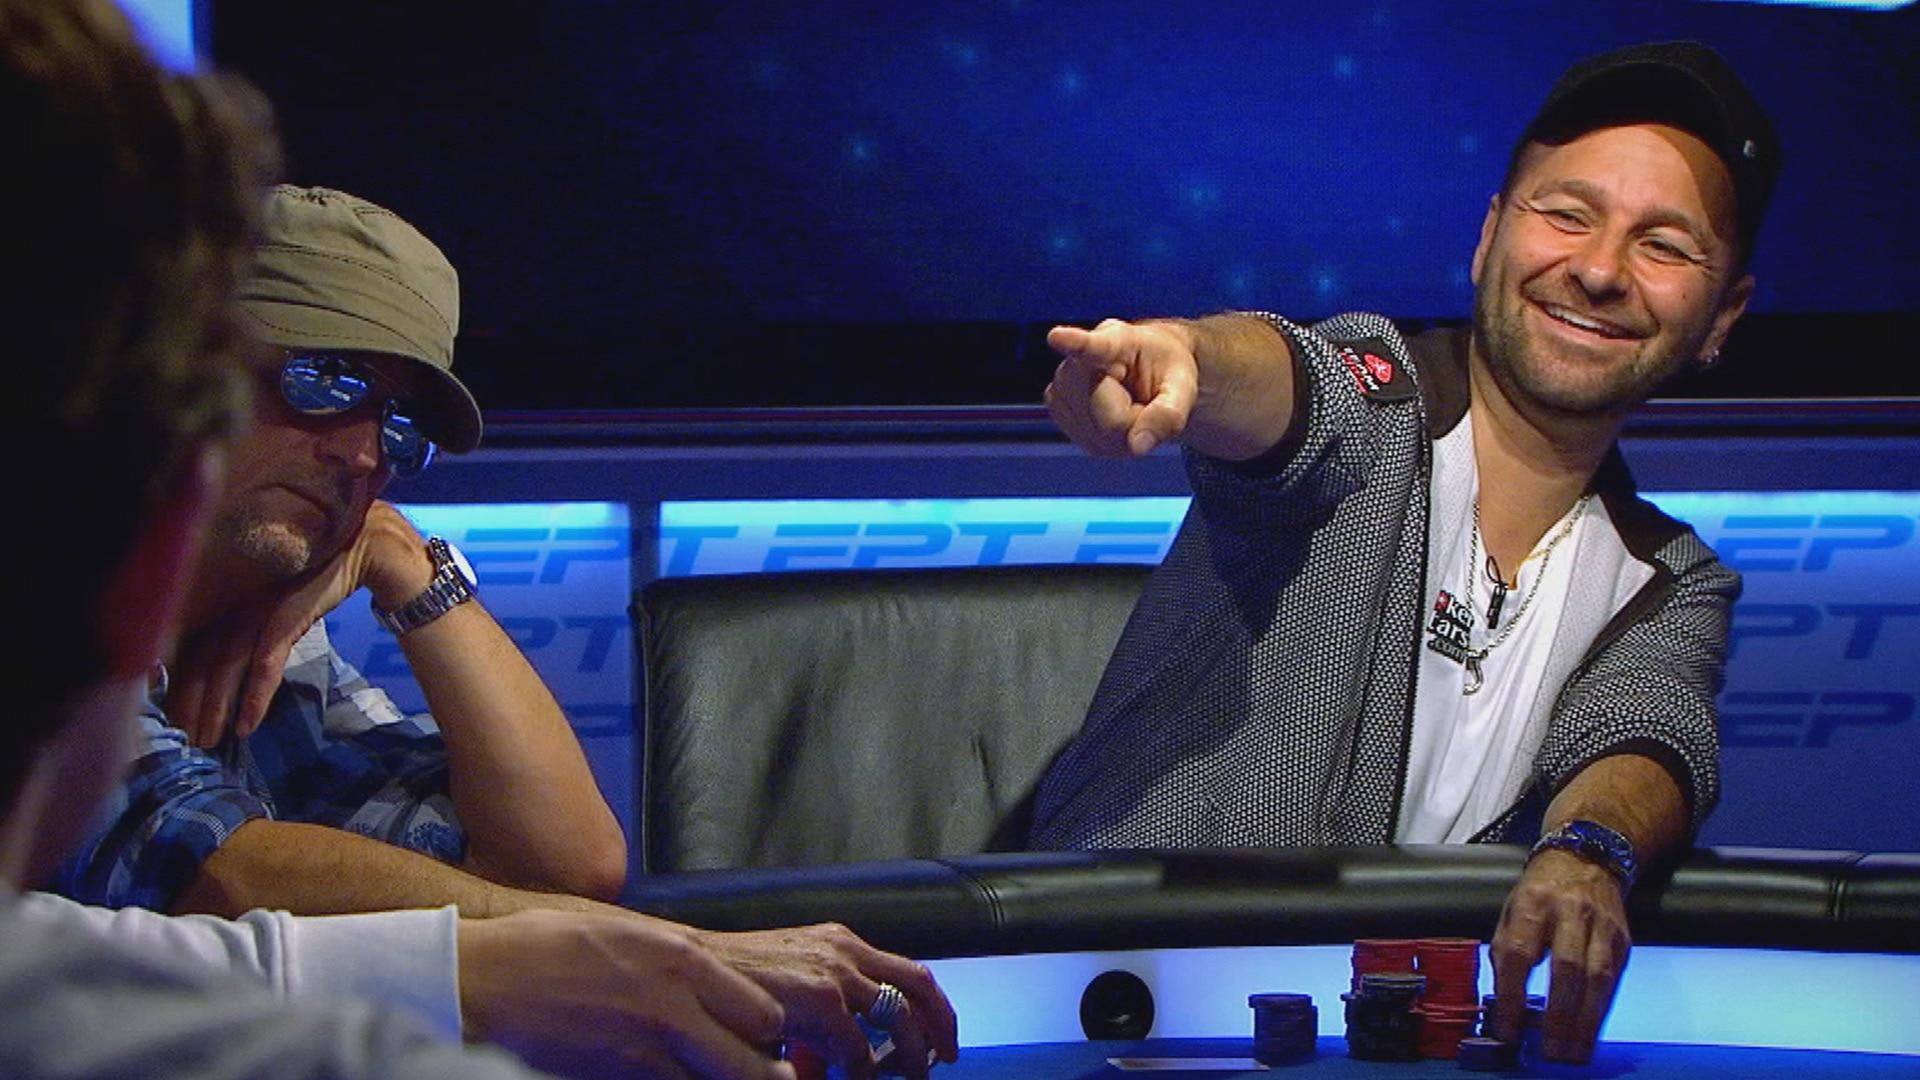 PokerStars.com European Poker Tour